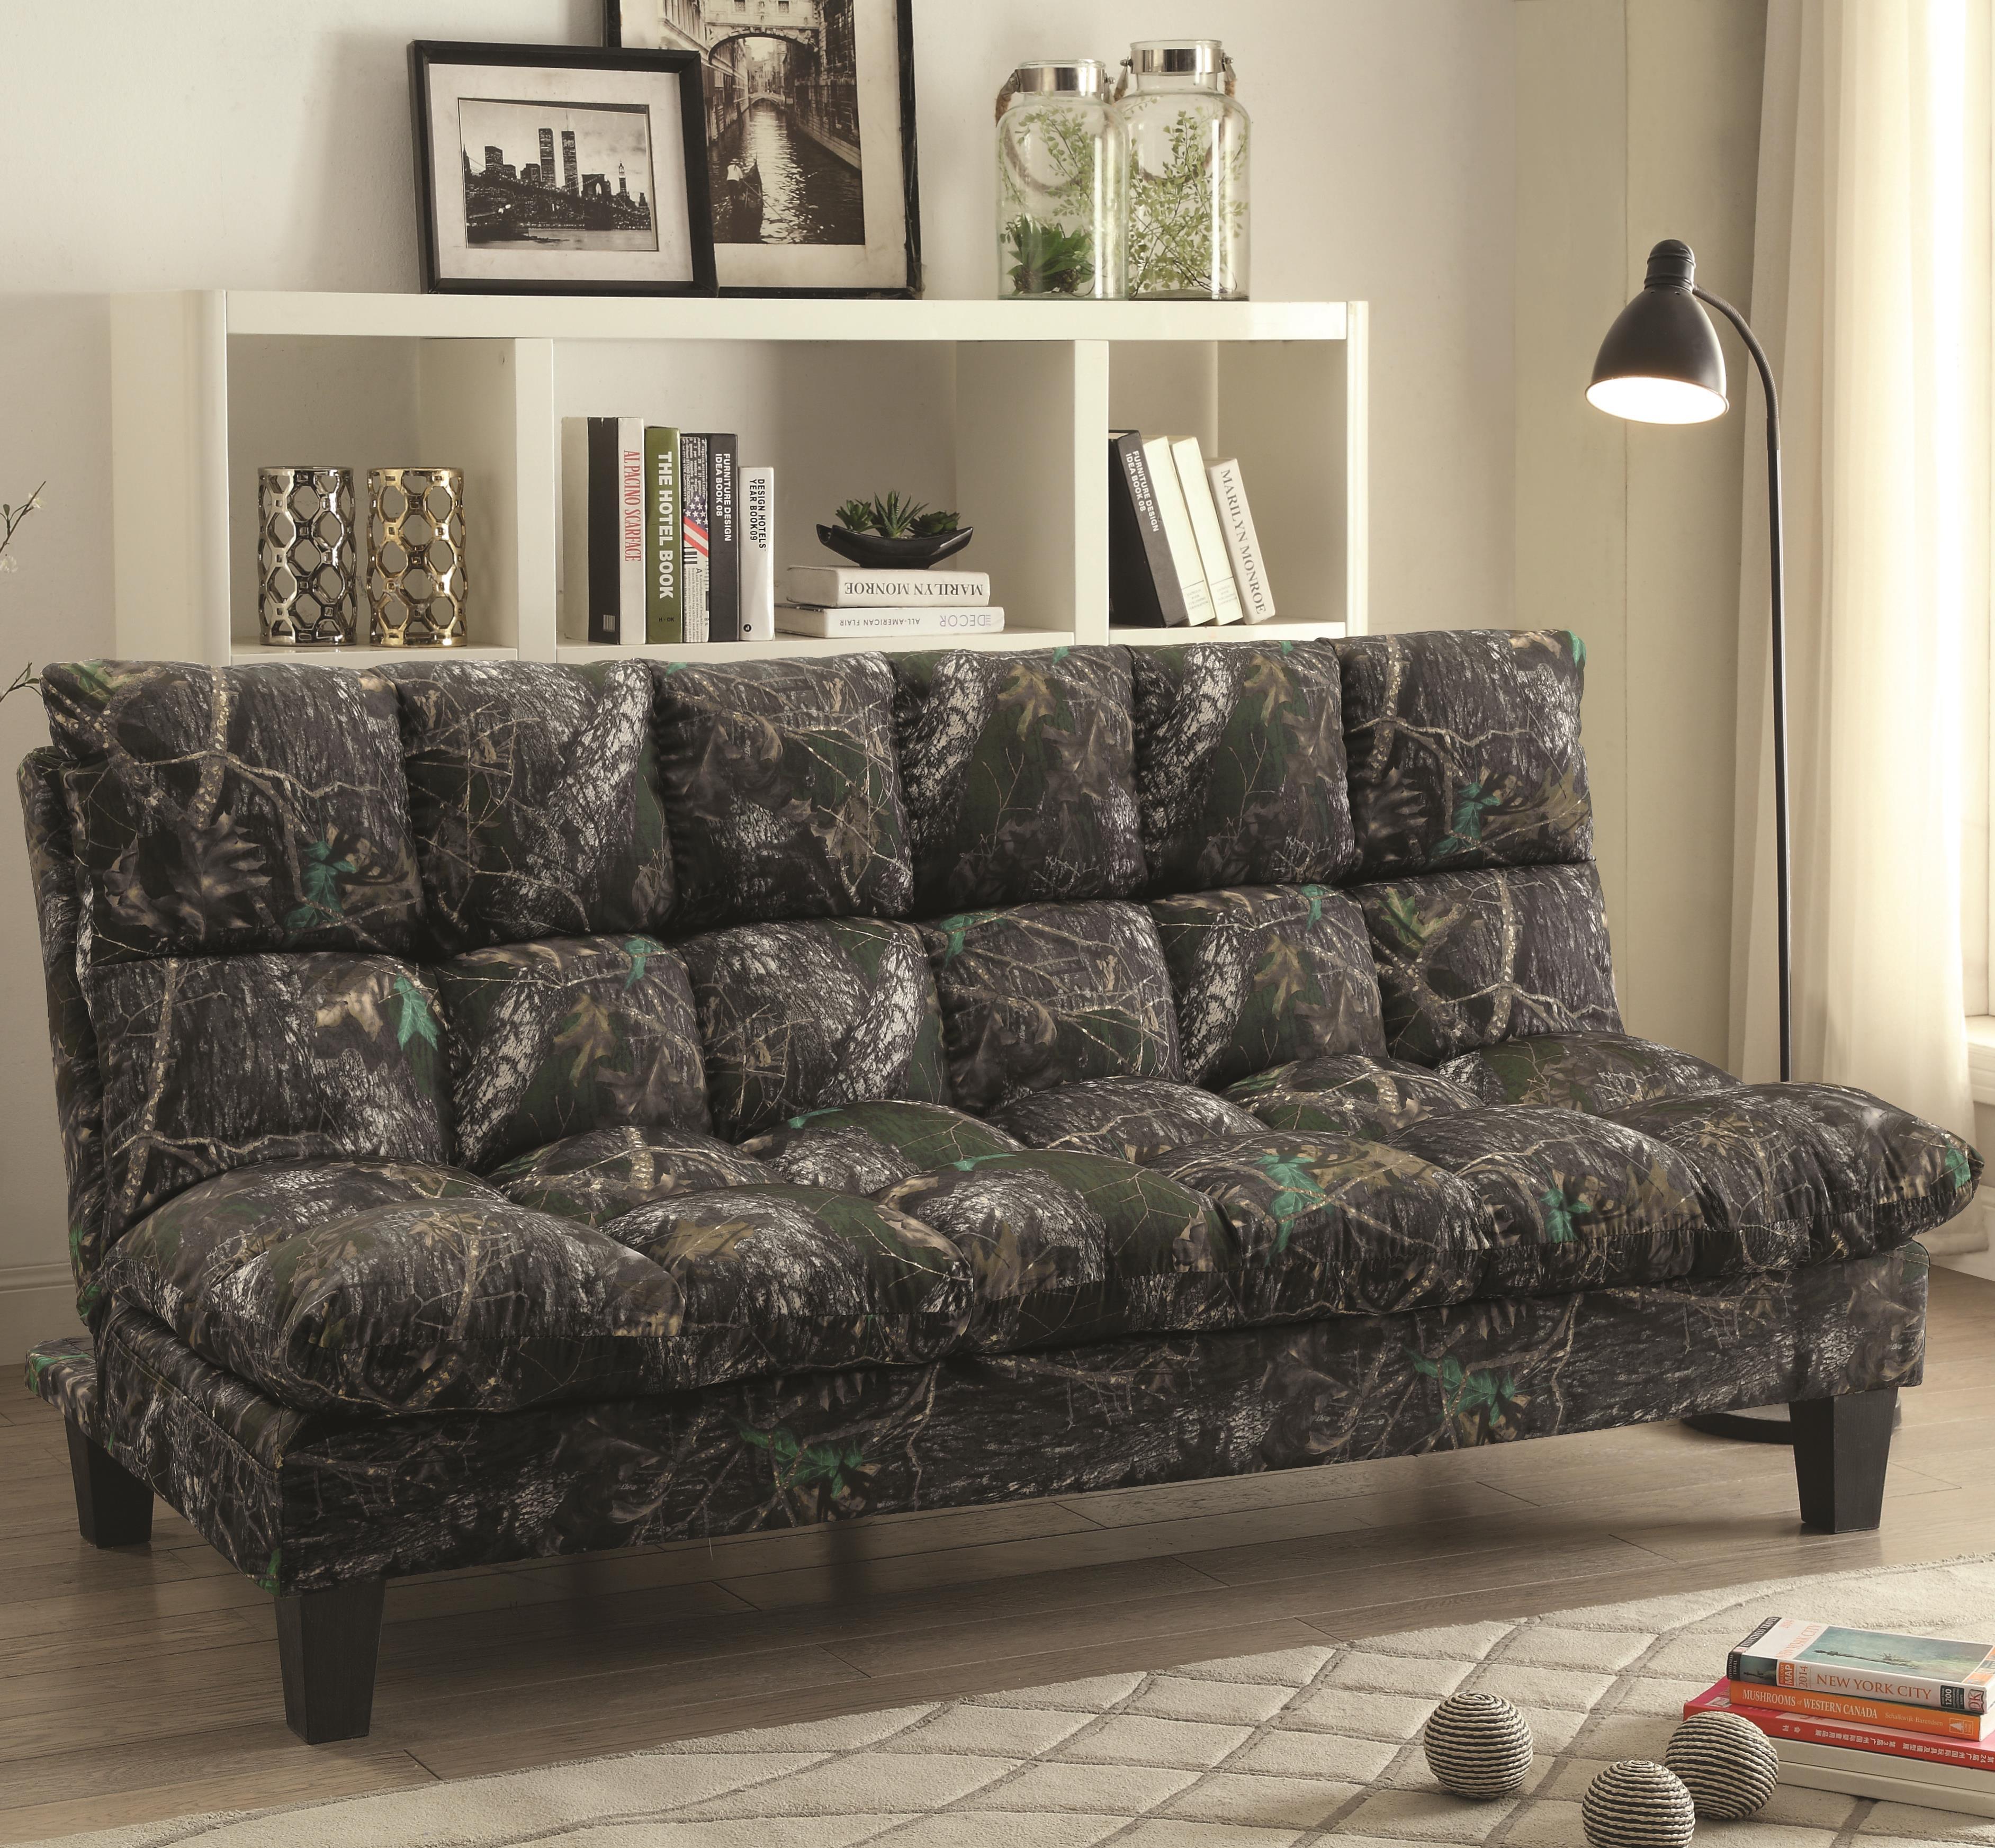 Coaster Sofa Beds and Futons -  Sofa Bed  - Item Number: 551066